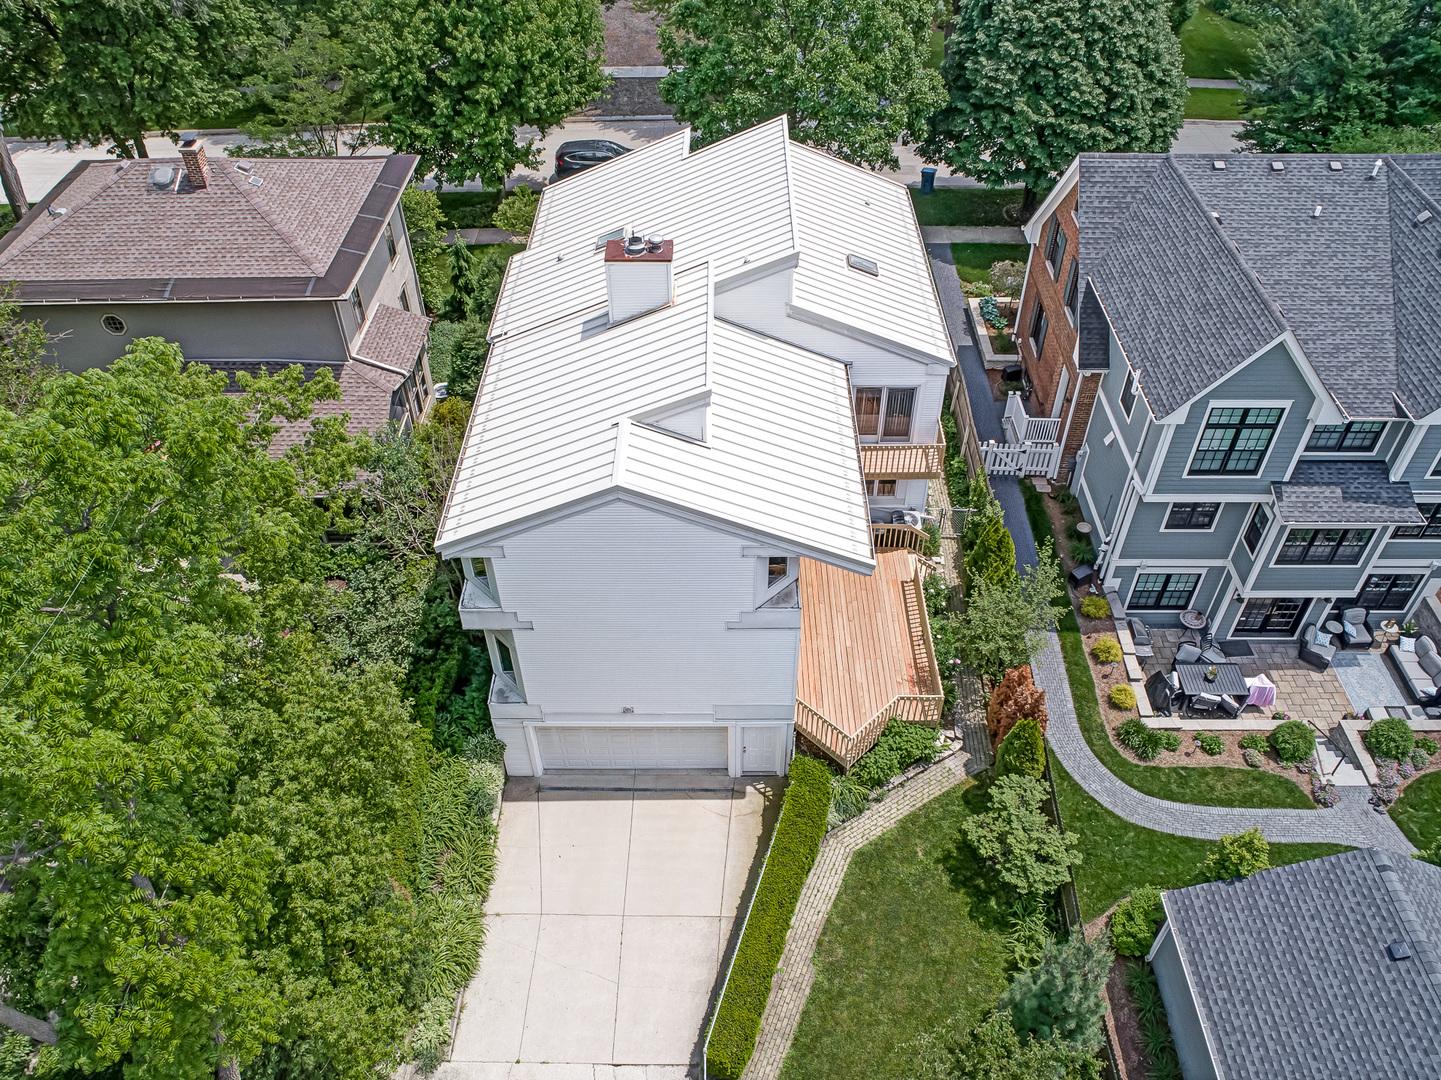 110 South Adams, Hinsdale, Illinois, 60521